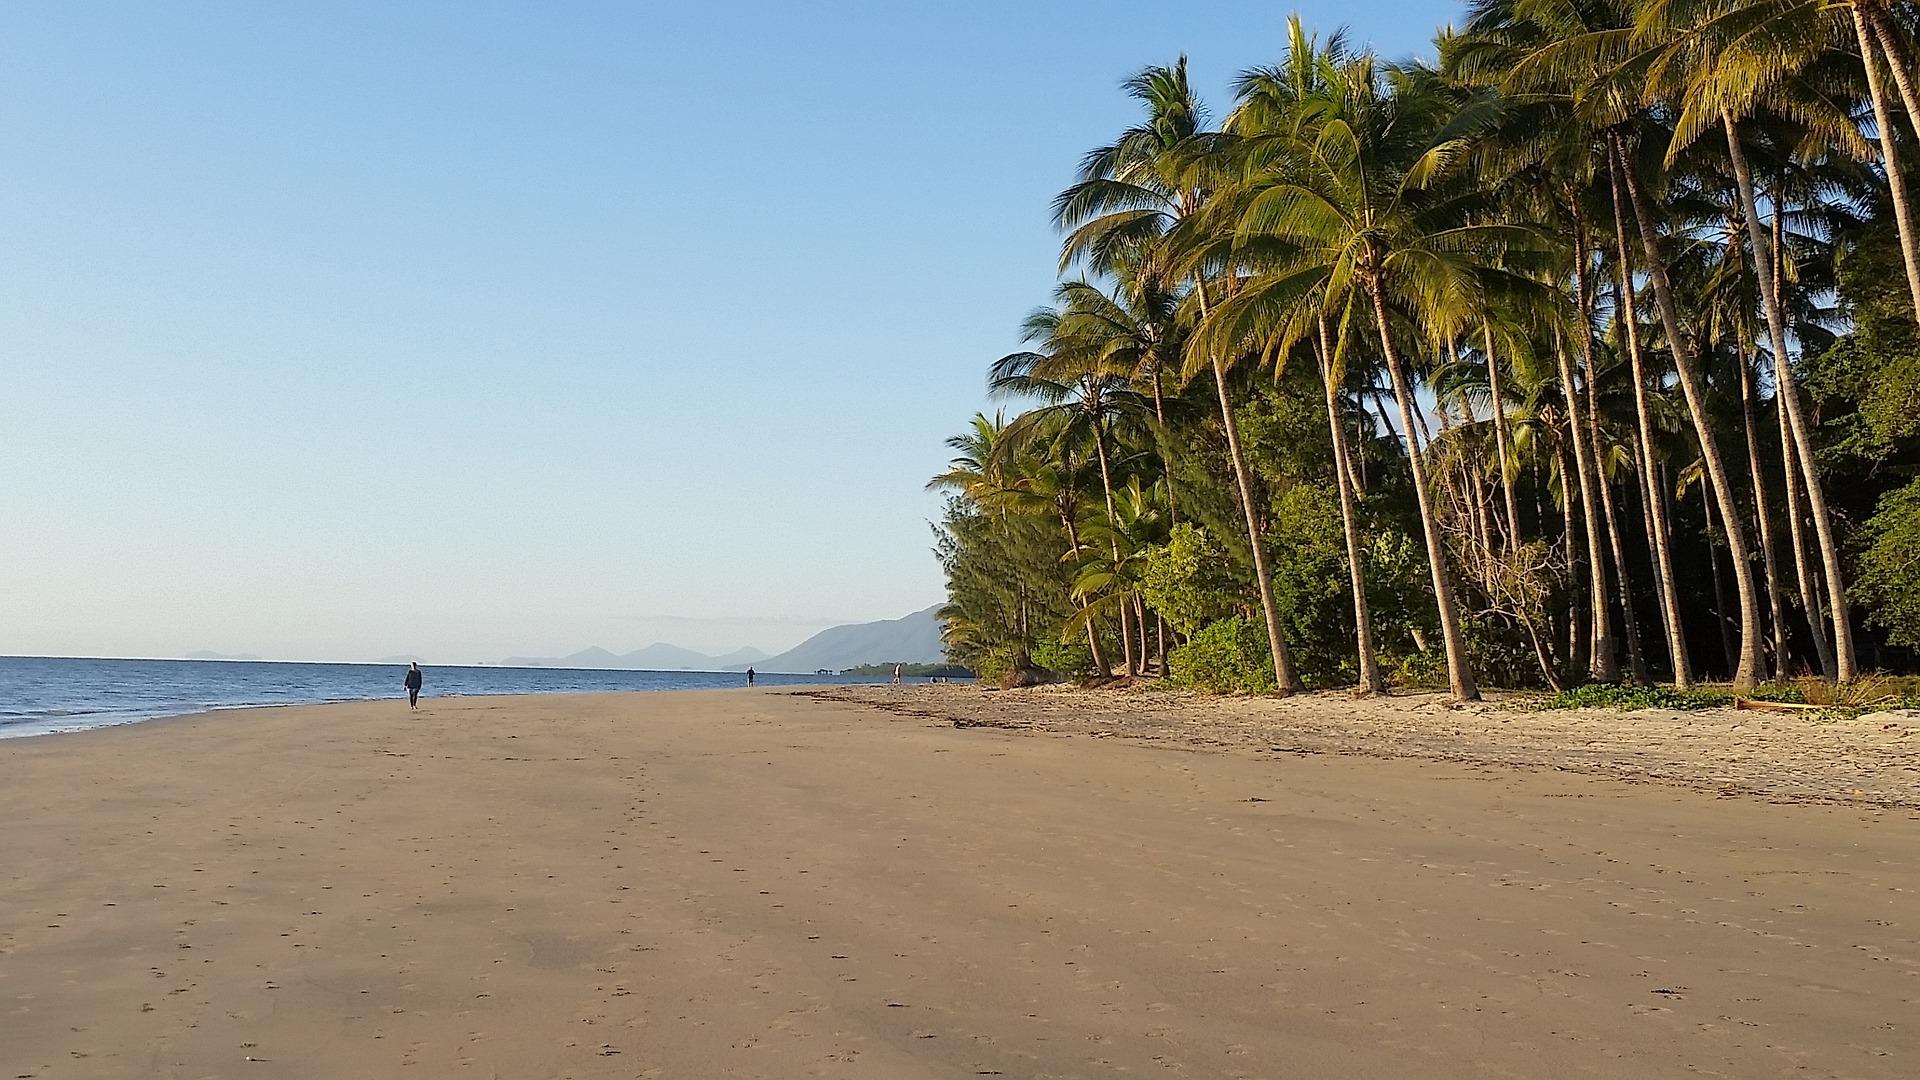 five-mile-beach-970981_1920.jpg